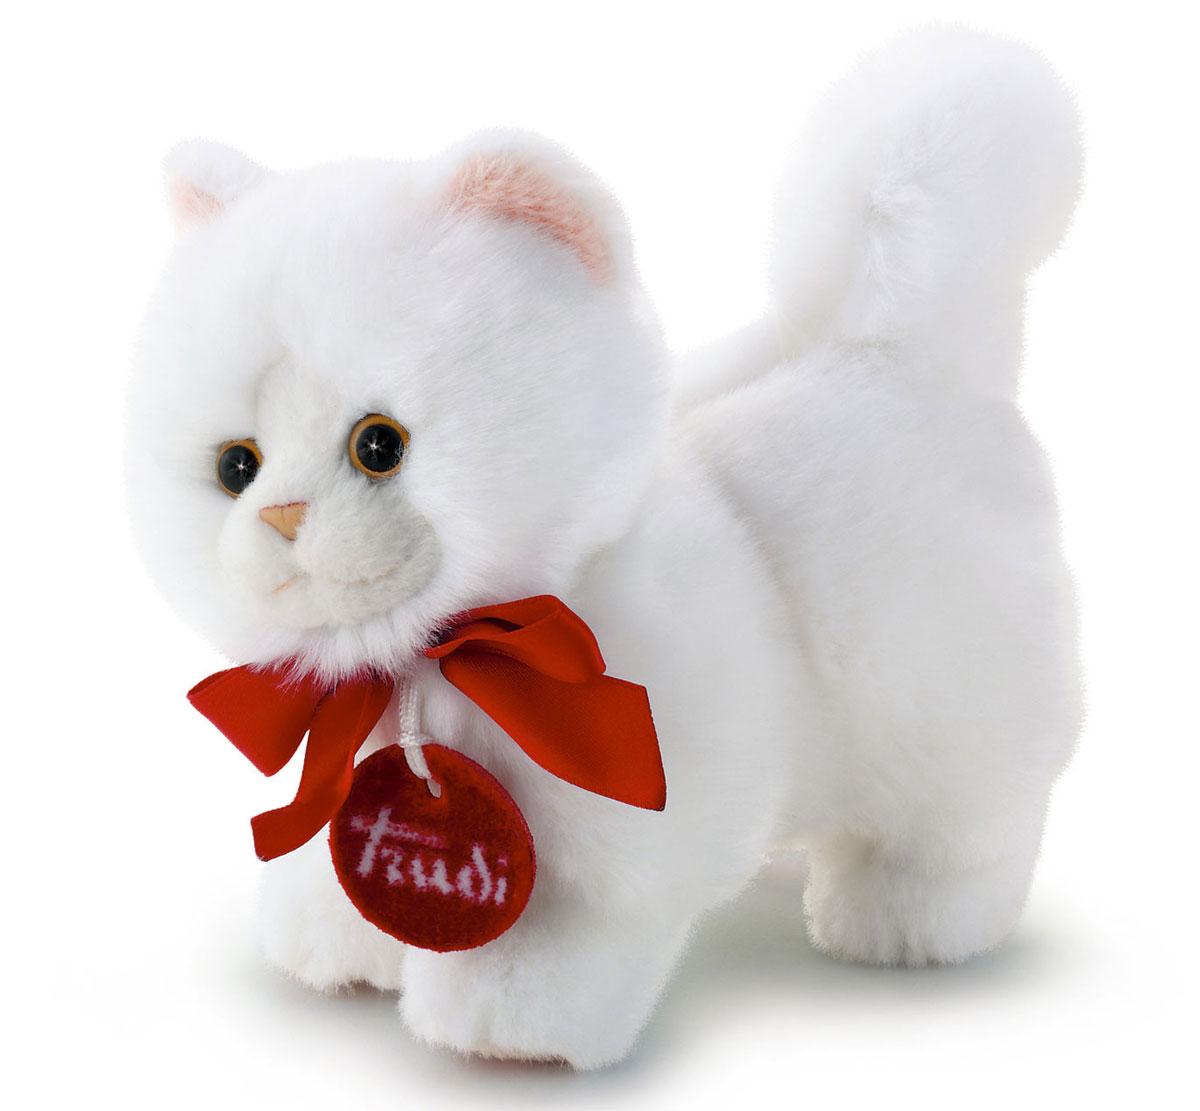 Trudi Мягкая игрушка Белая кошечка делюкс 15 см мягкие игрушки trudi лайка маркус 34 см